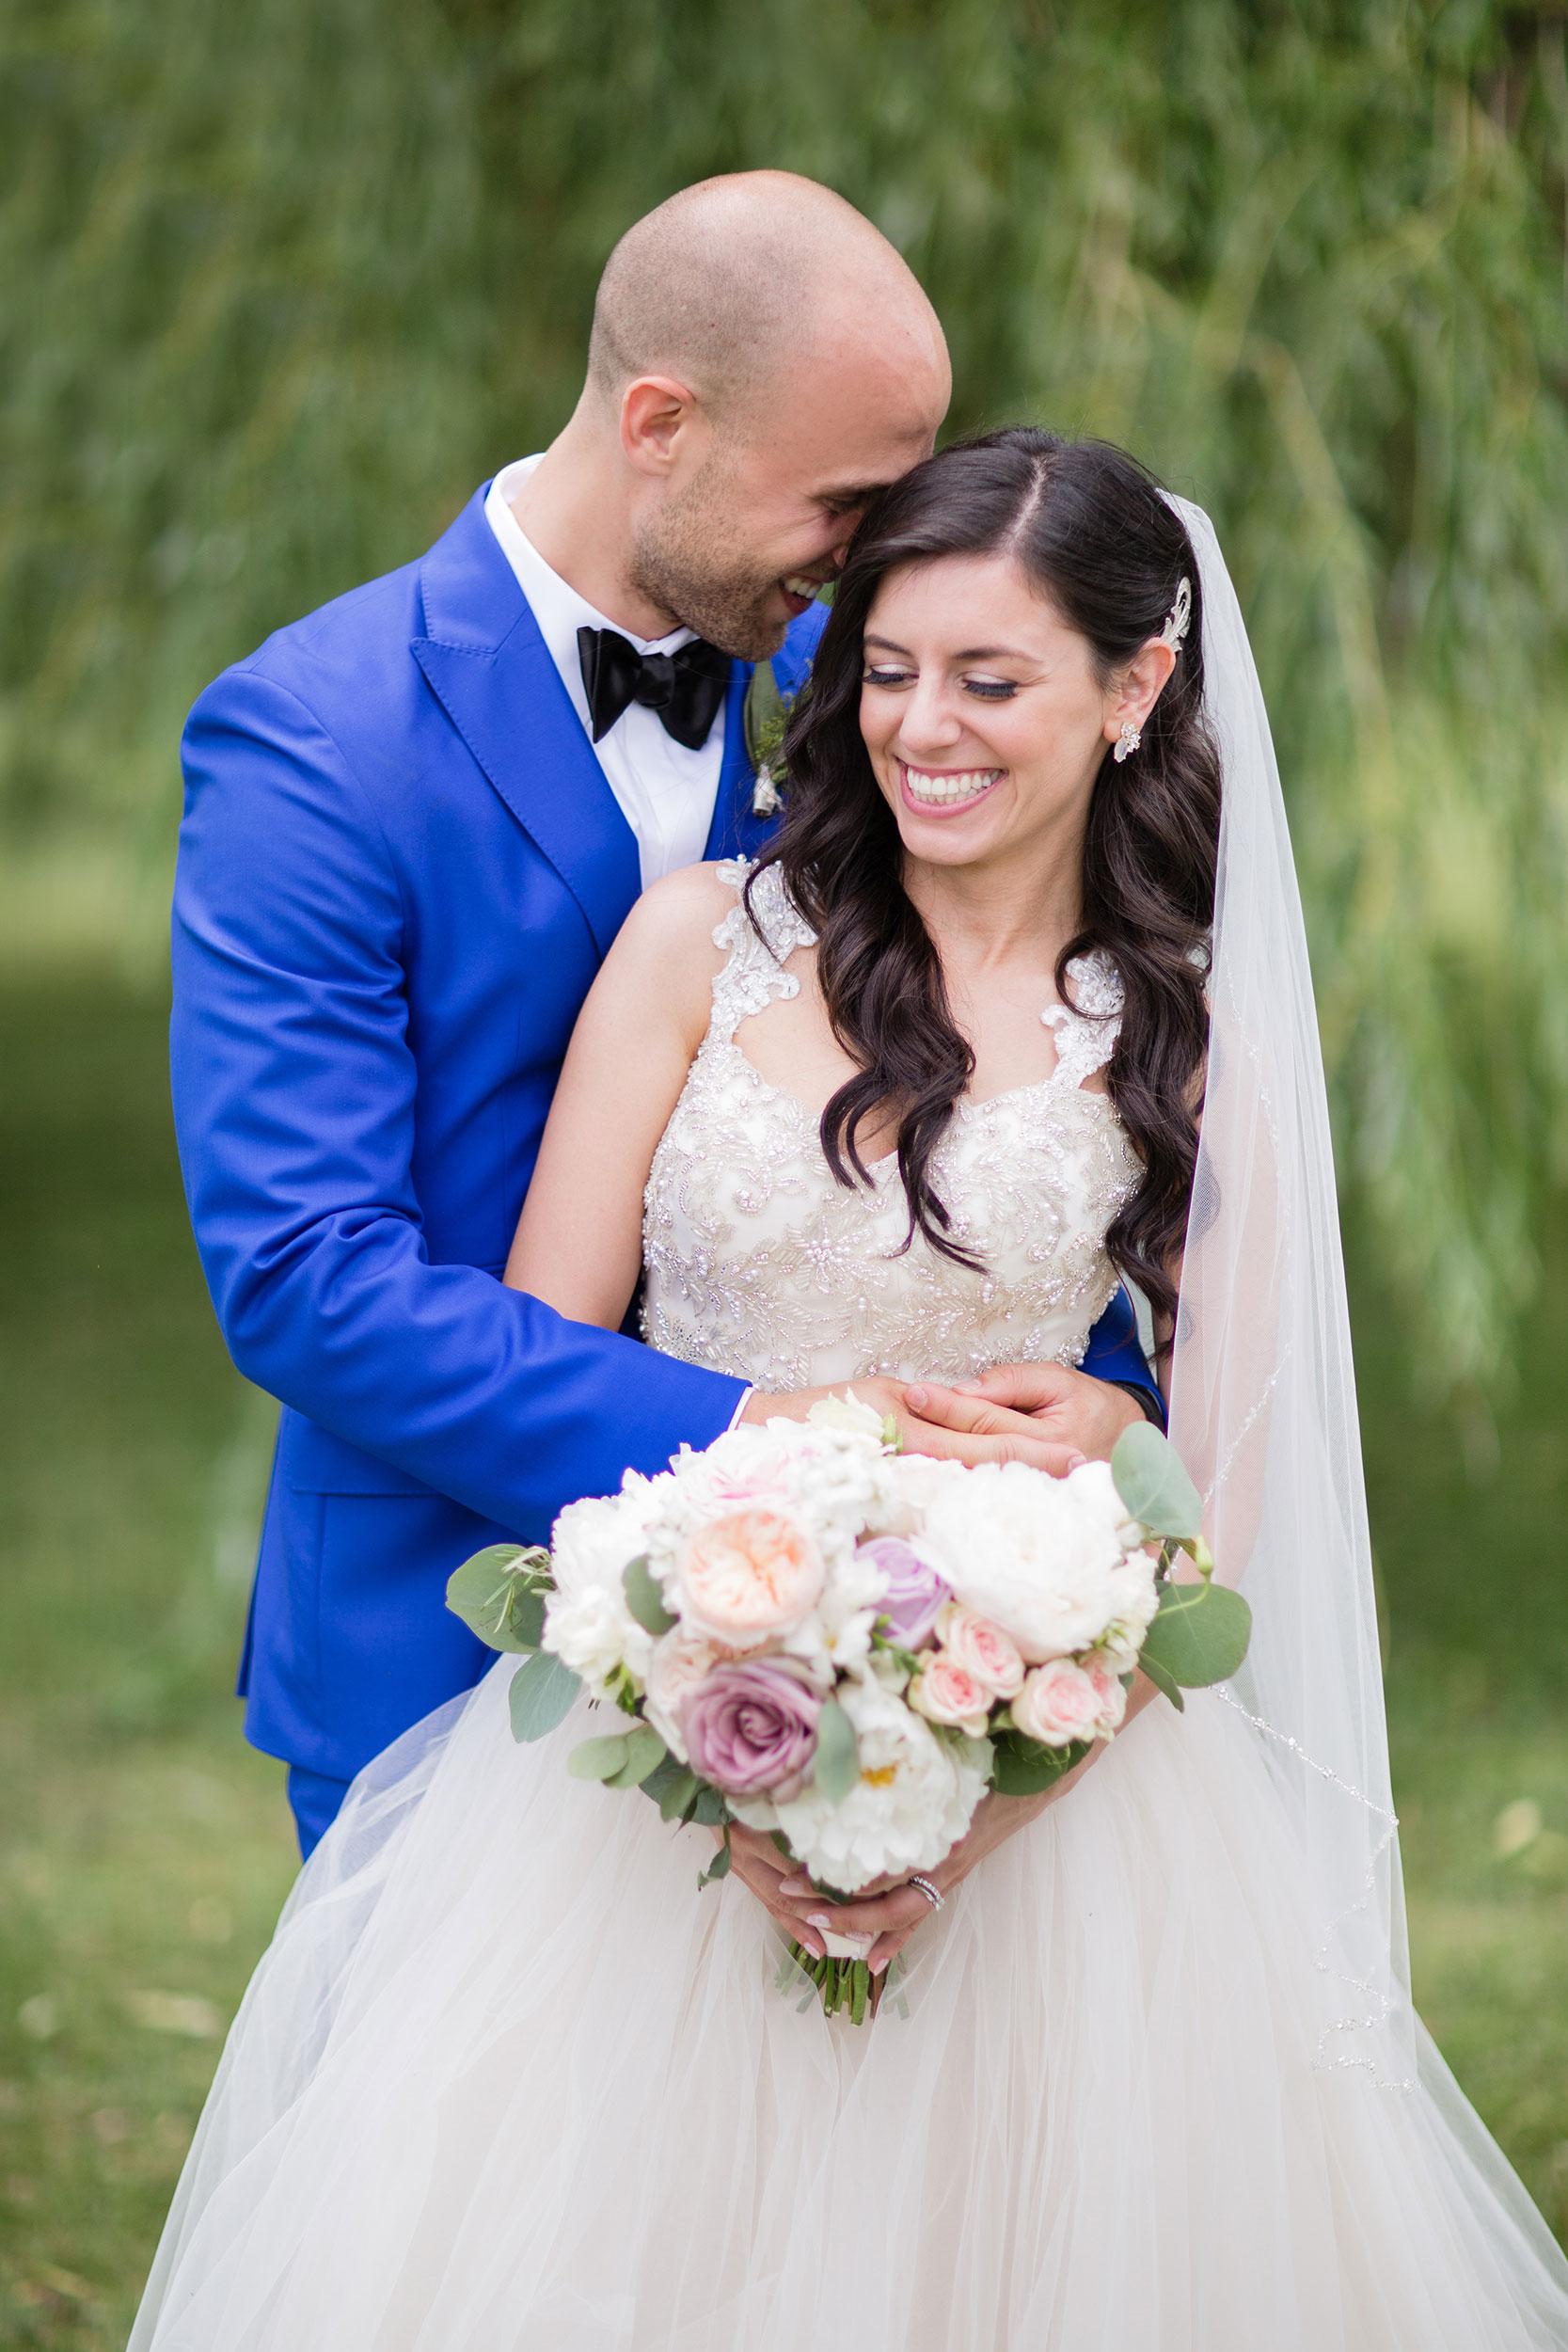 stylish-wedding-photography-windsor-toronto-ontario-wedding-photographer-sprucewood-winery-eryn-shea-photography-42.JPG